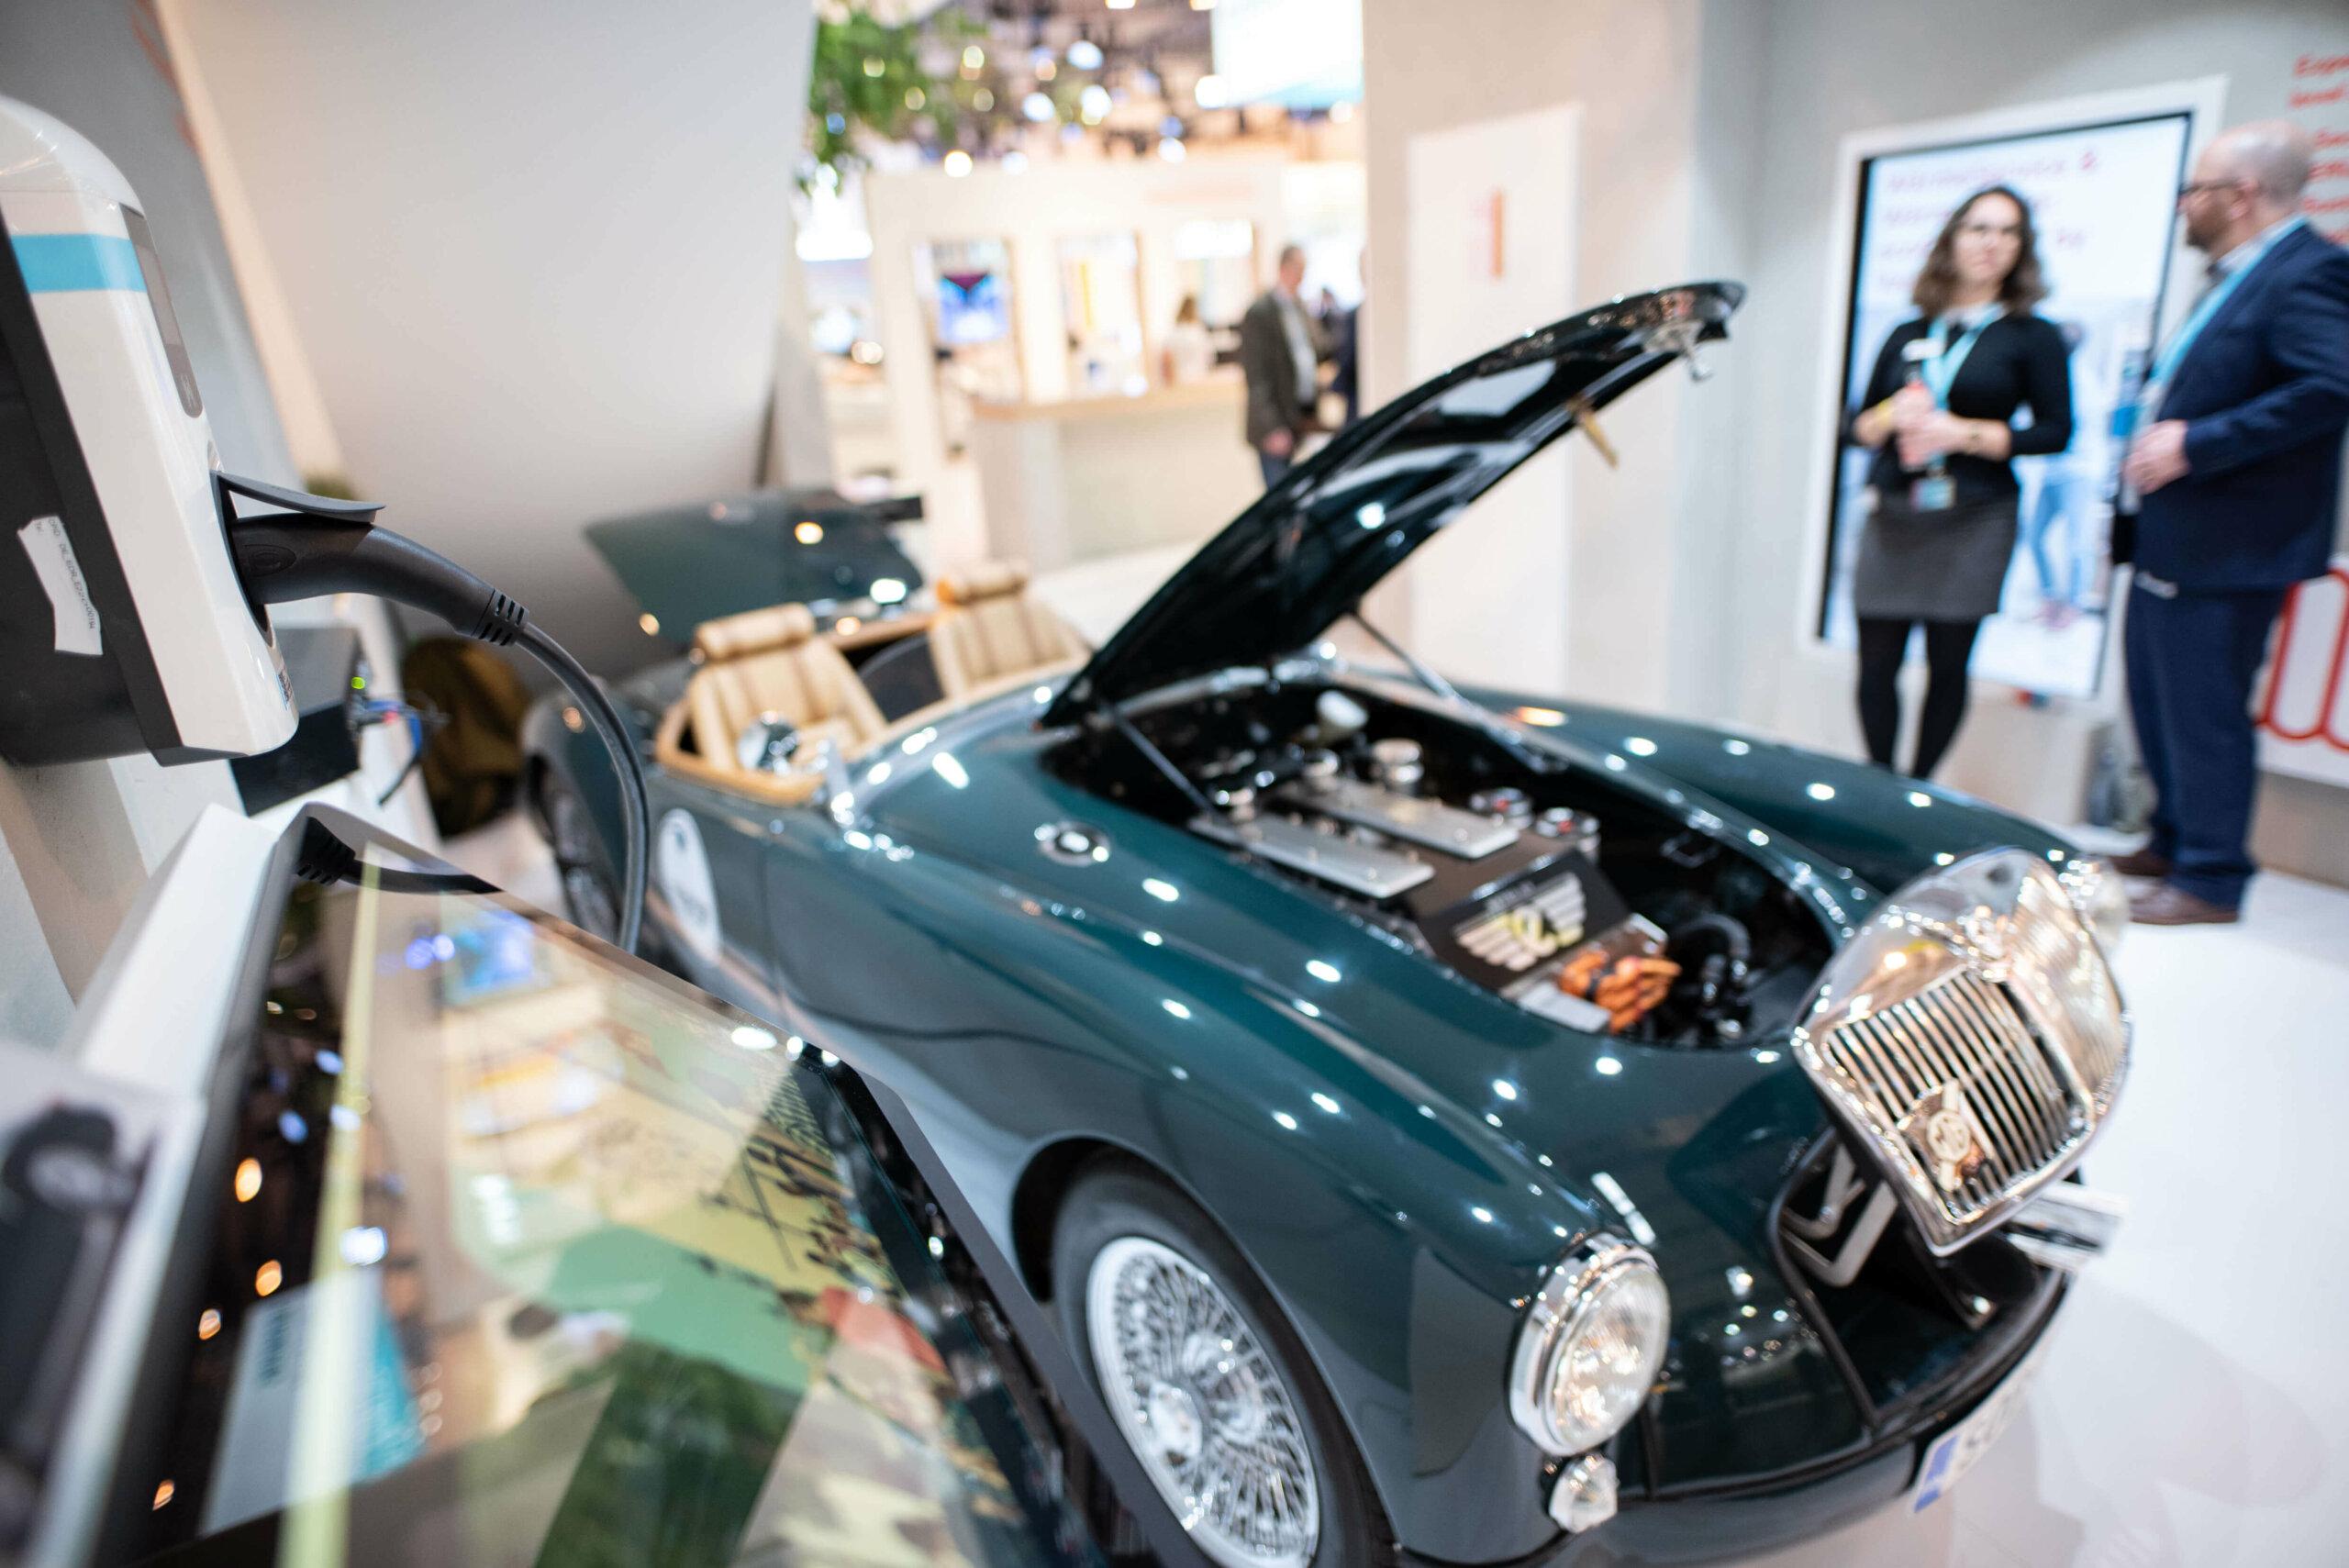 E-Auto mit geöffneter Motorhaube